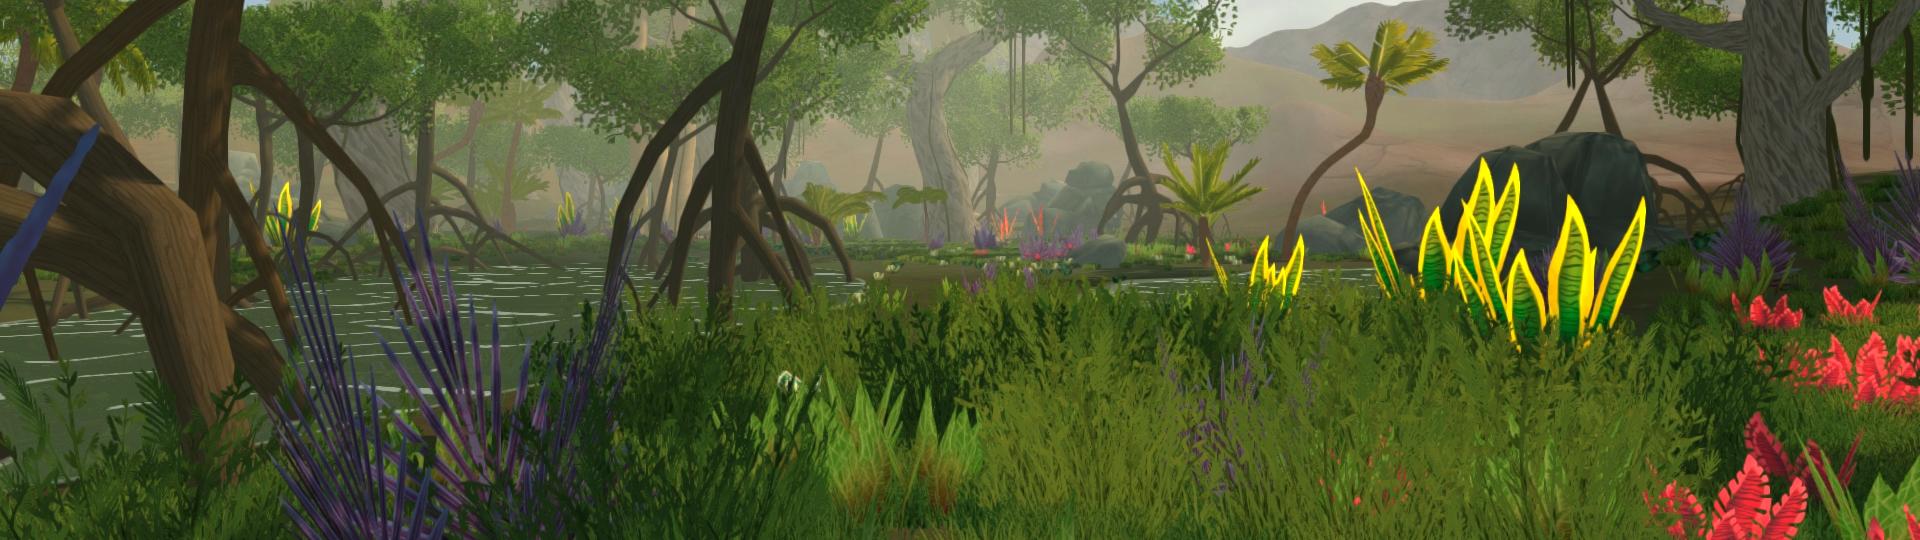 wide jungle 02